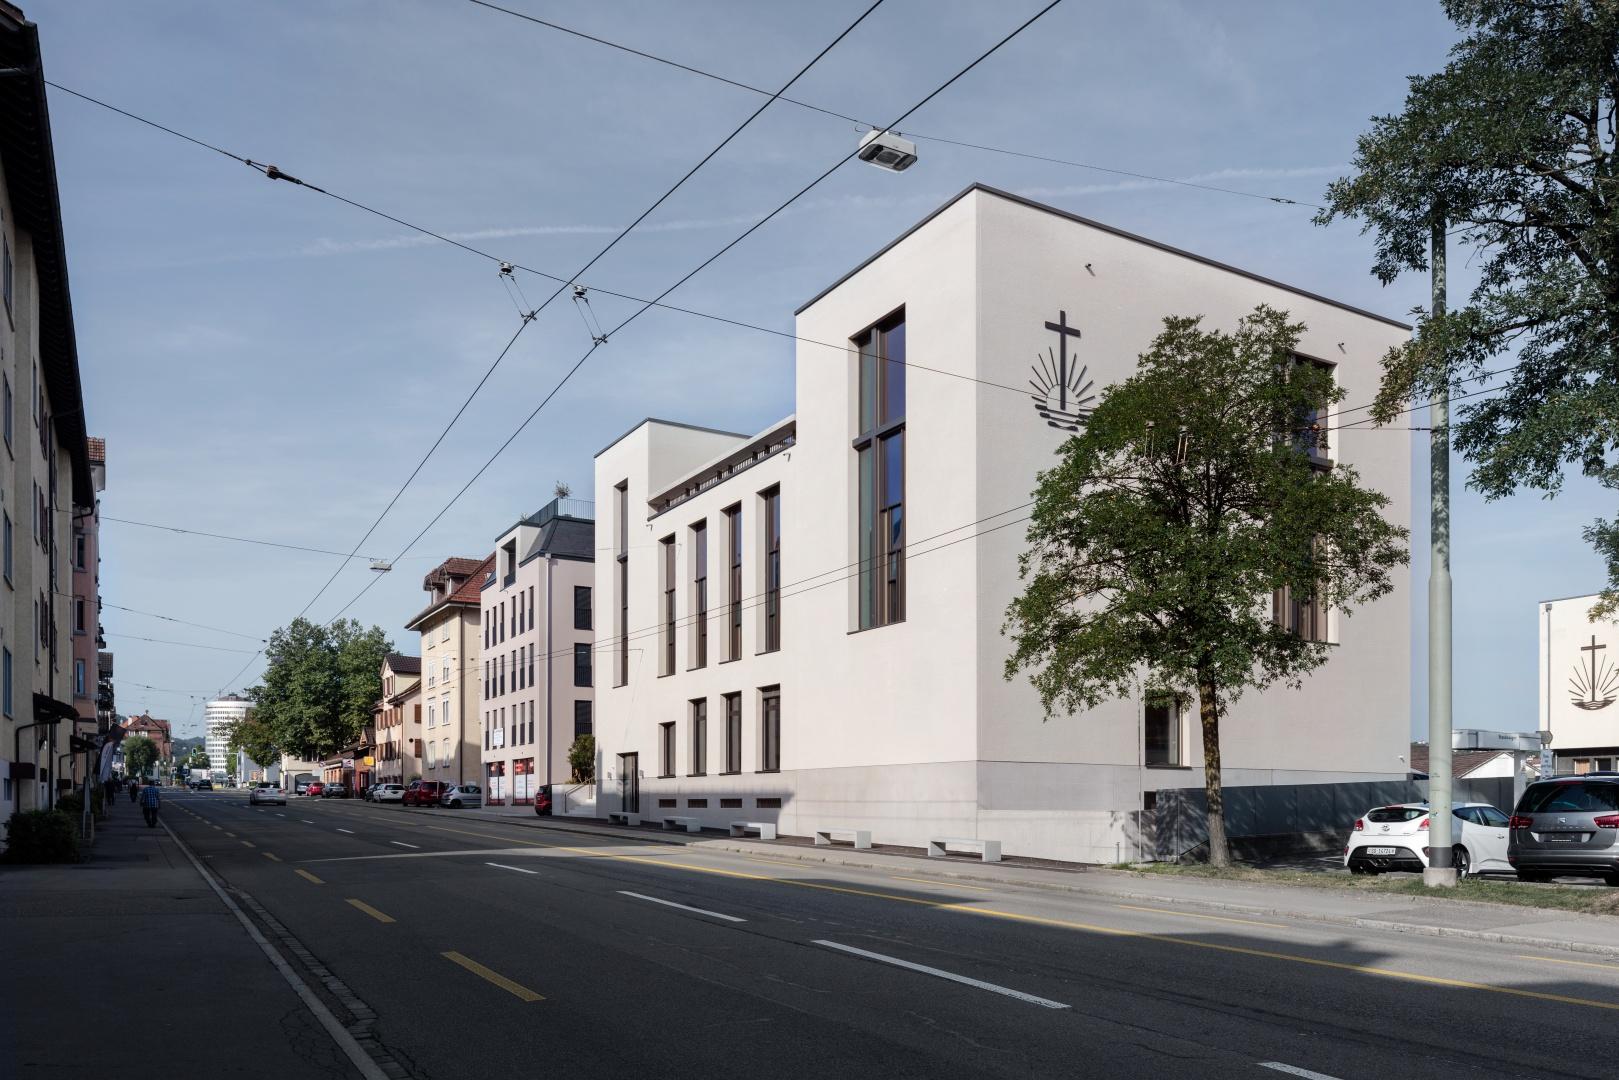 © direco ag, Wilenstrasse 23, 9532 Rickenbach b. Wil